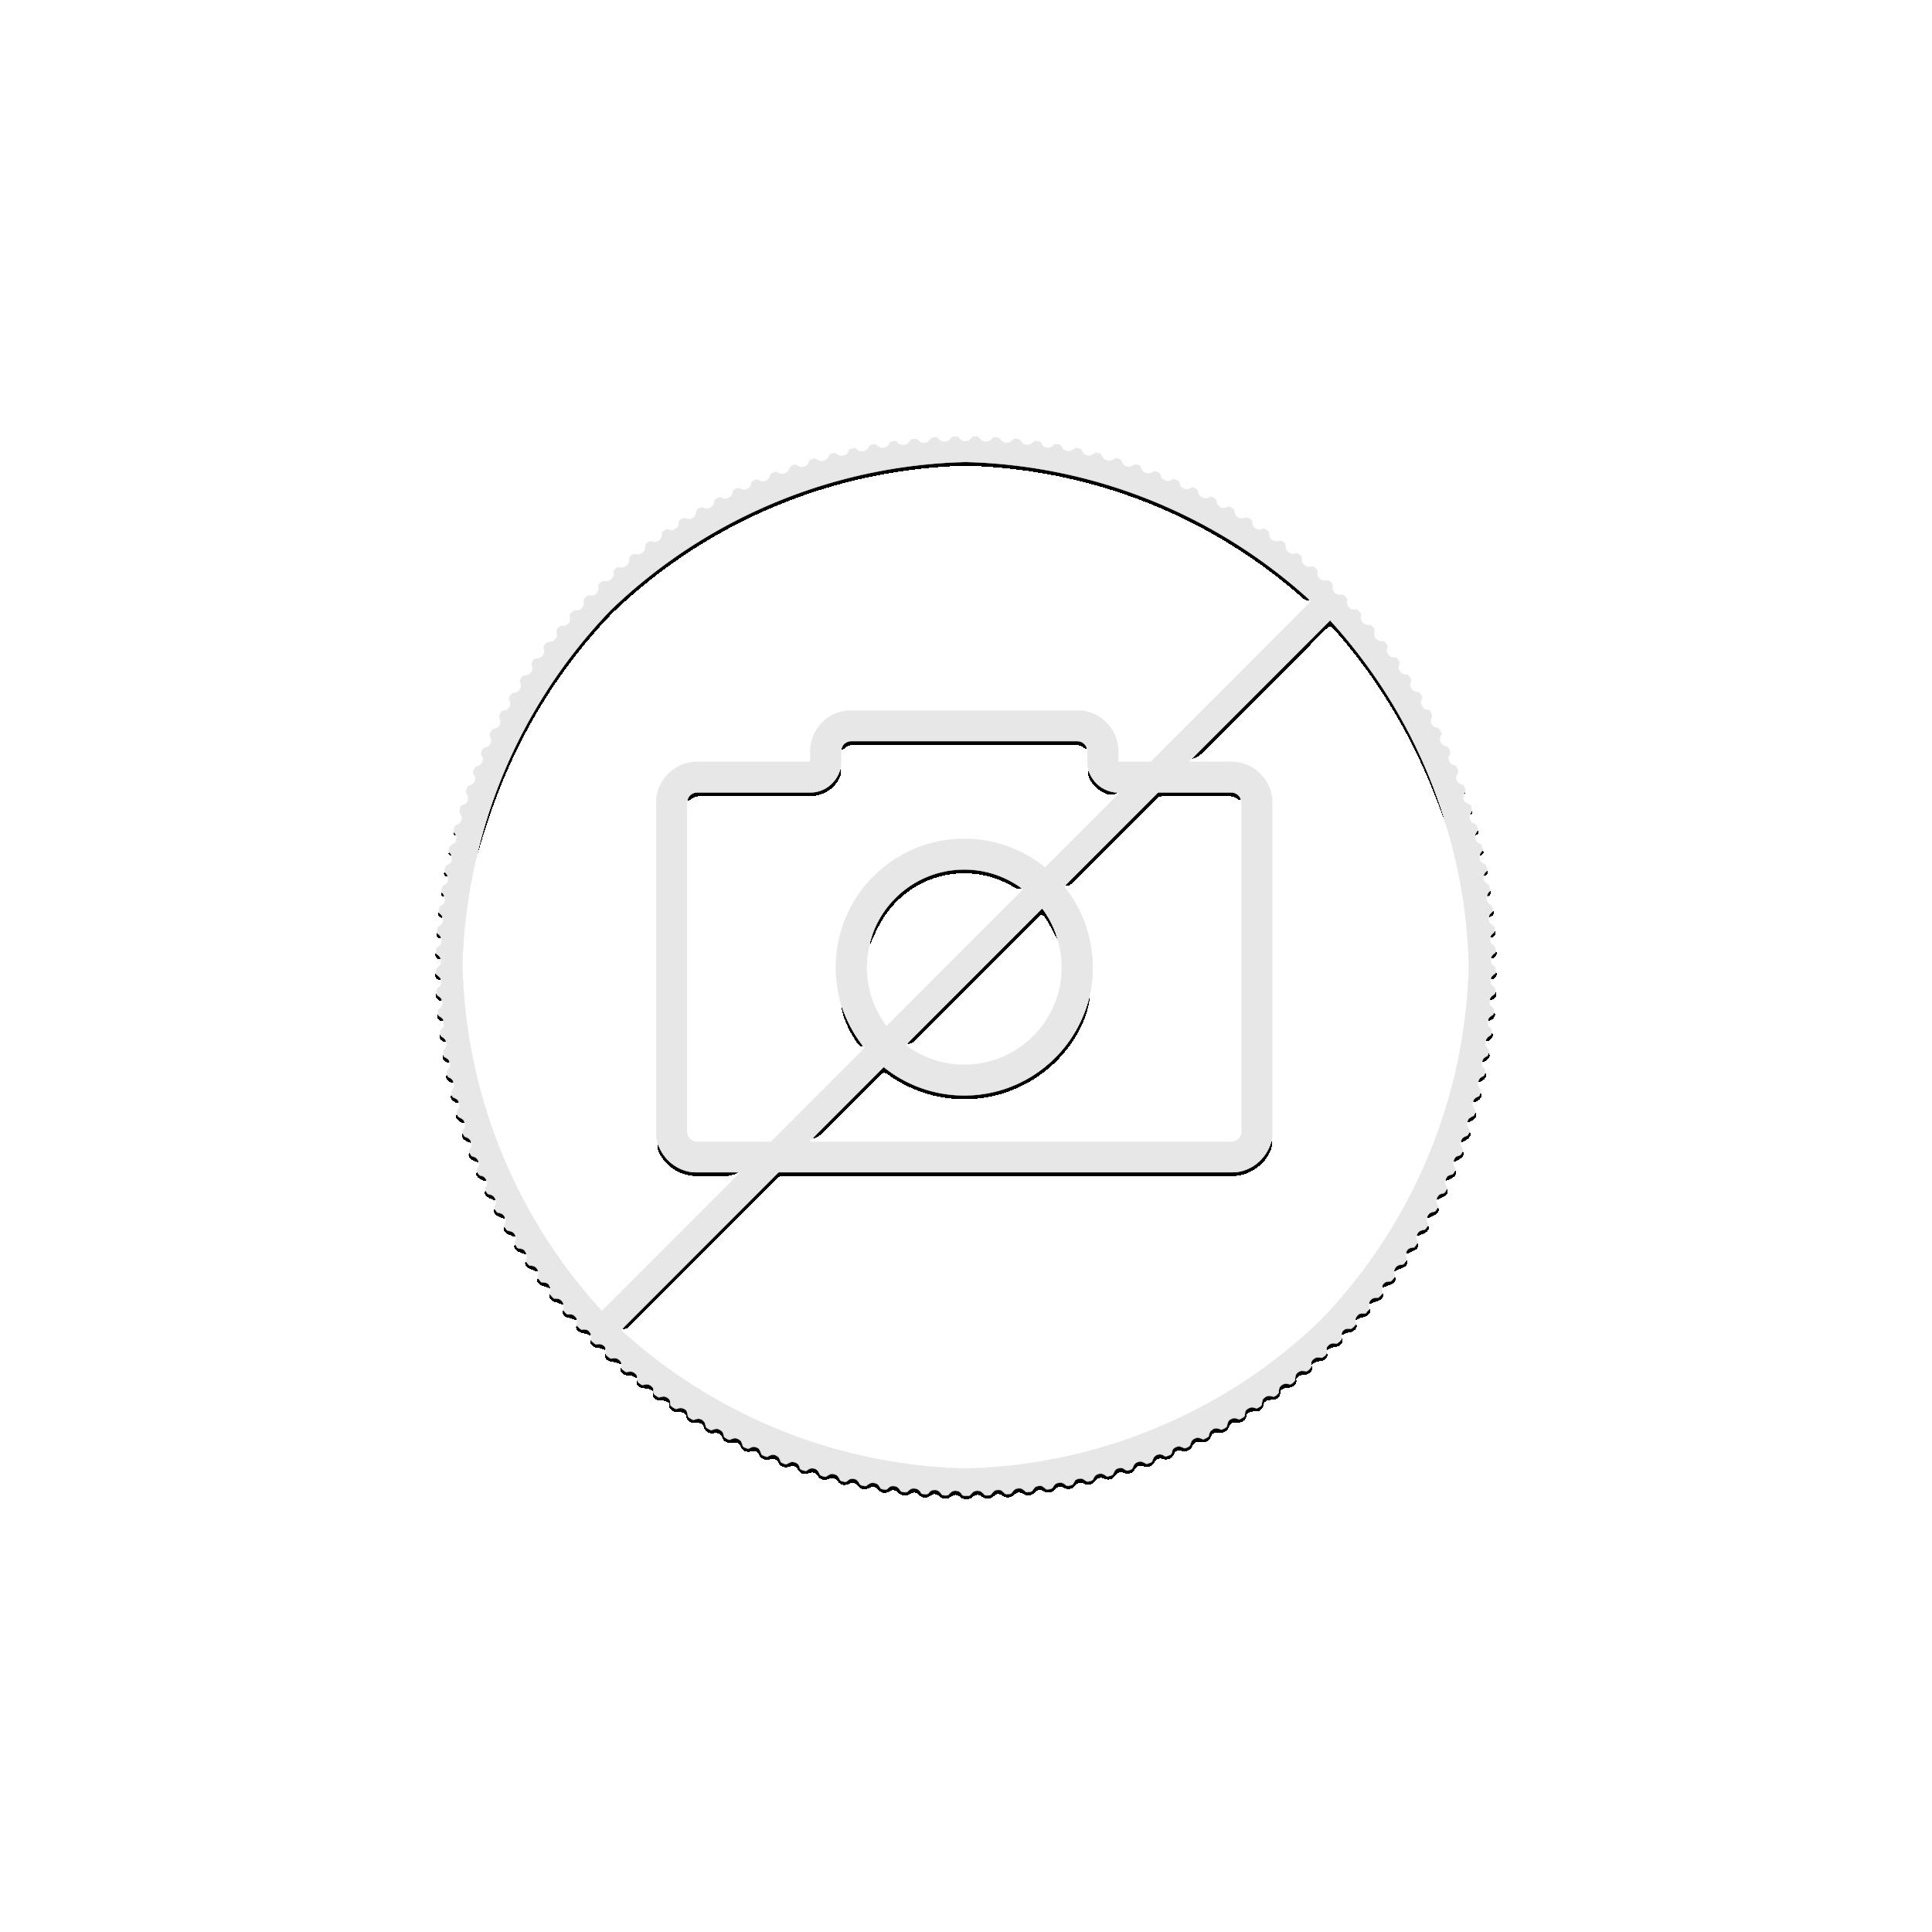 1 troy ounce gold coin swan 2020